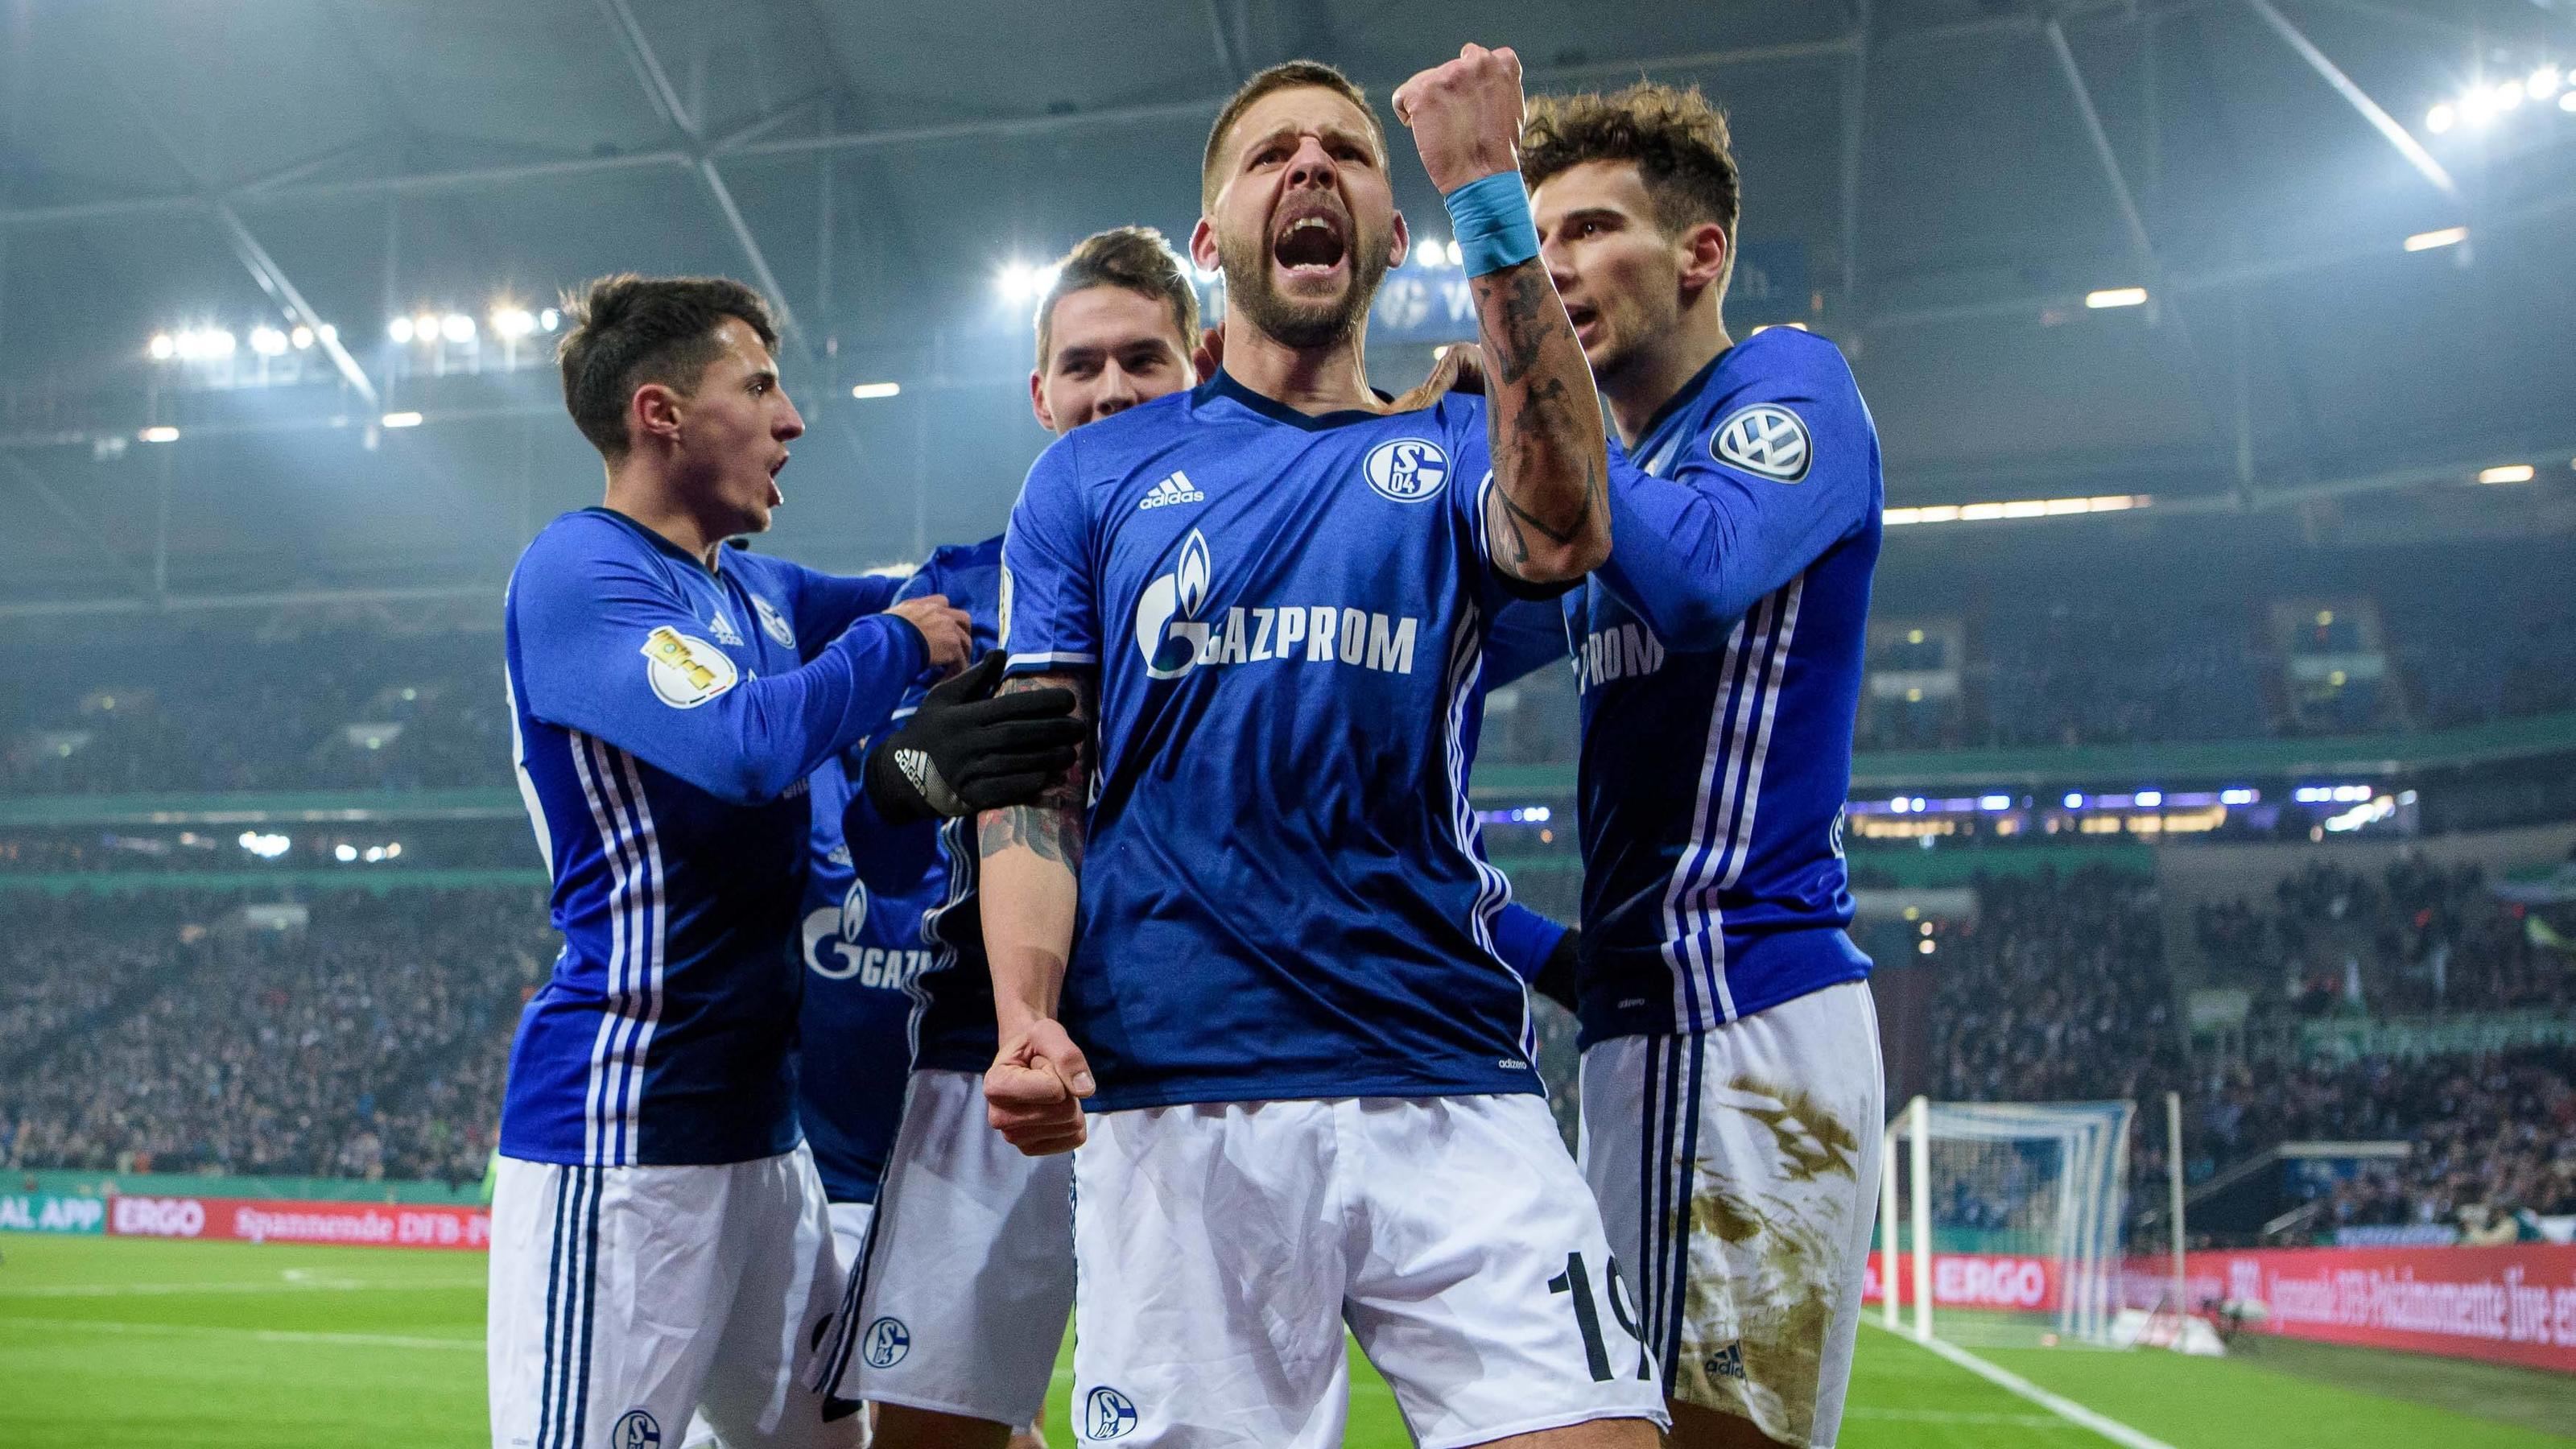 Прогноз на матч Боруссия Менхенгладбах - Шальке 04 09 декабря 2017